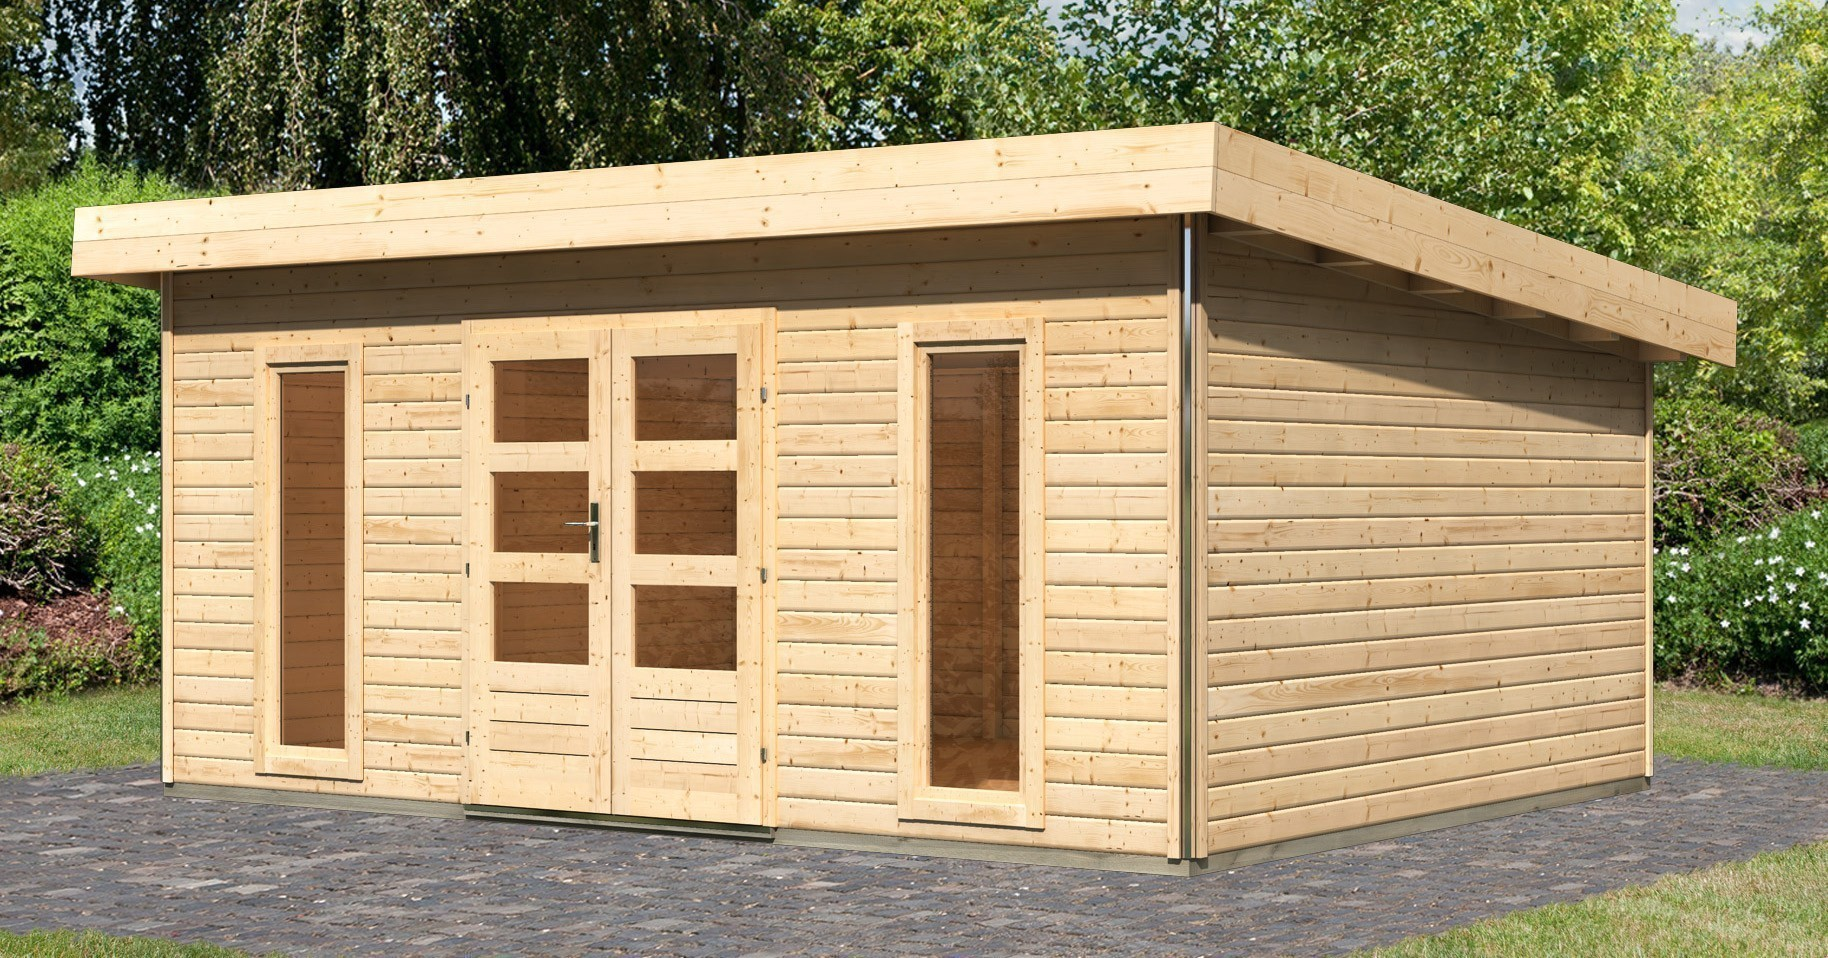 karibu gartenhaus 40mm tecklenburg 3 natur 536x422cm bei. Black Bedroom Furniture Sets. Home Design Ideas